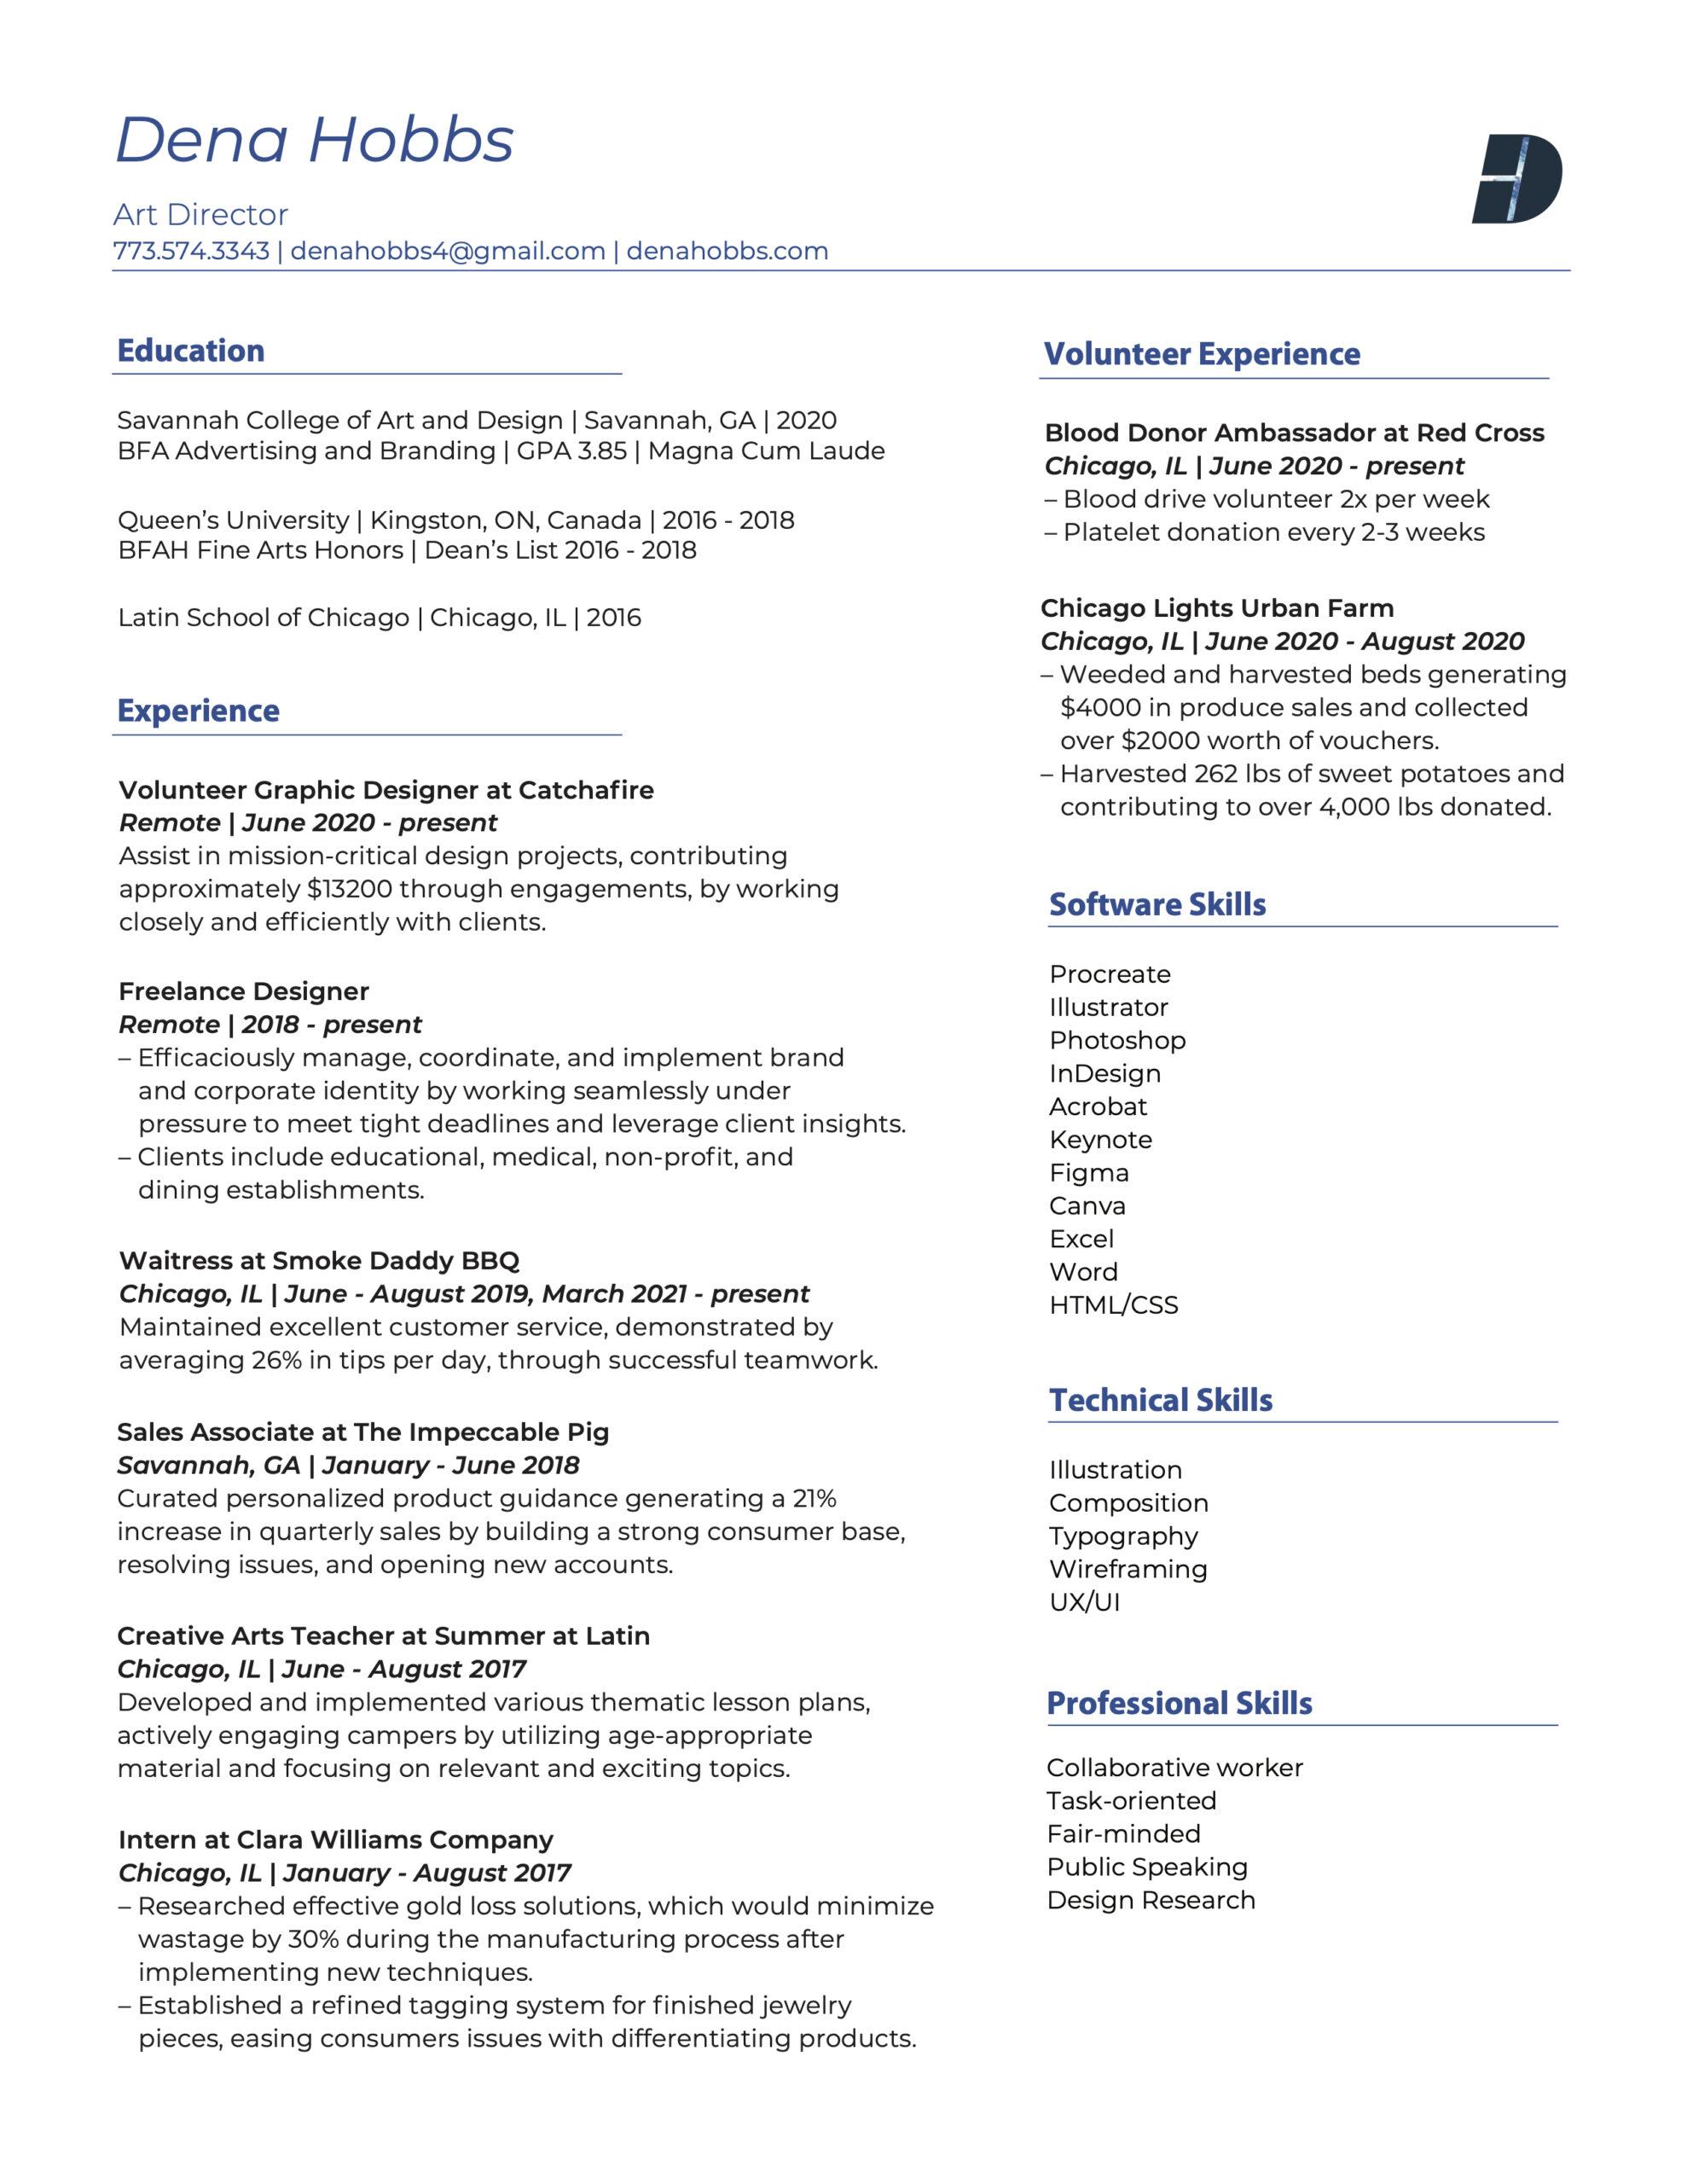 Hobbs_Dena_v_Resume